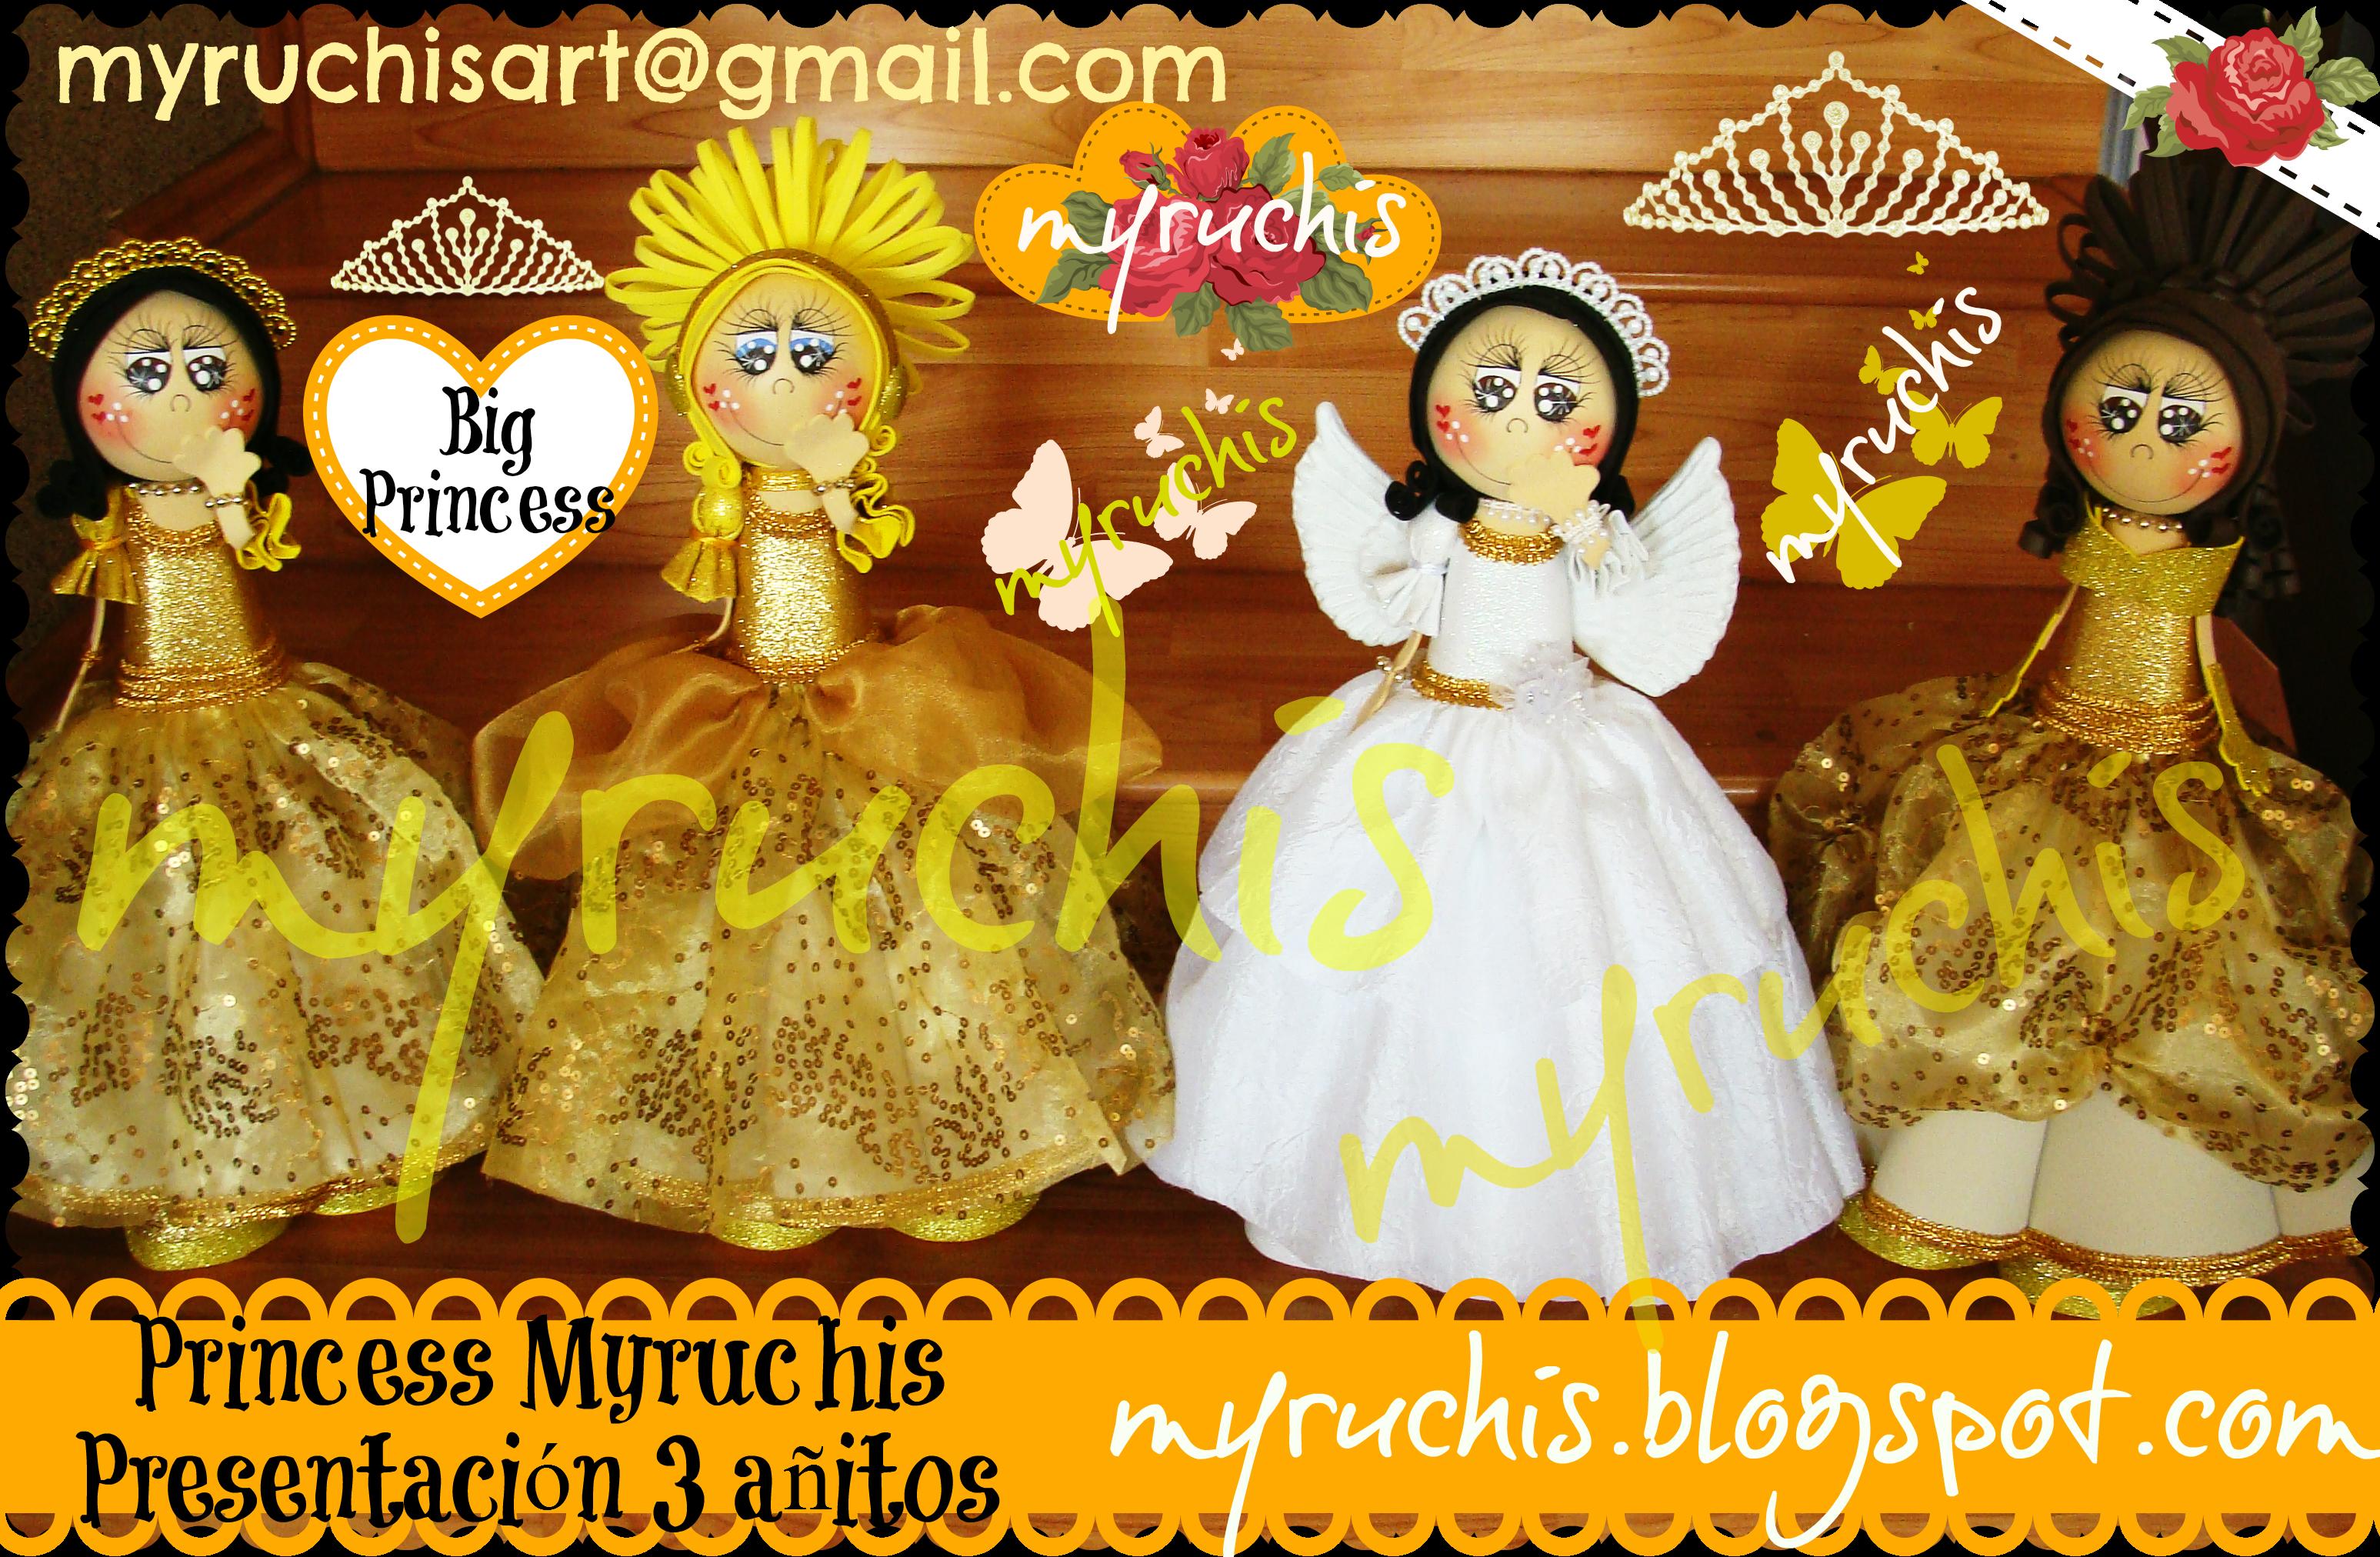 fiesta princesas, centros de mesa Infantiles, centros de mesa princesas, decoración fiestas, decoración fiesta princesas, ideas fiesta, ideas fiesta princesas myruchis.blogspot.com